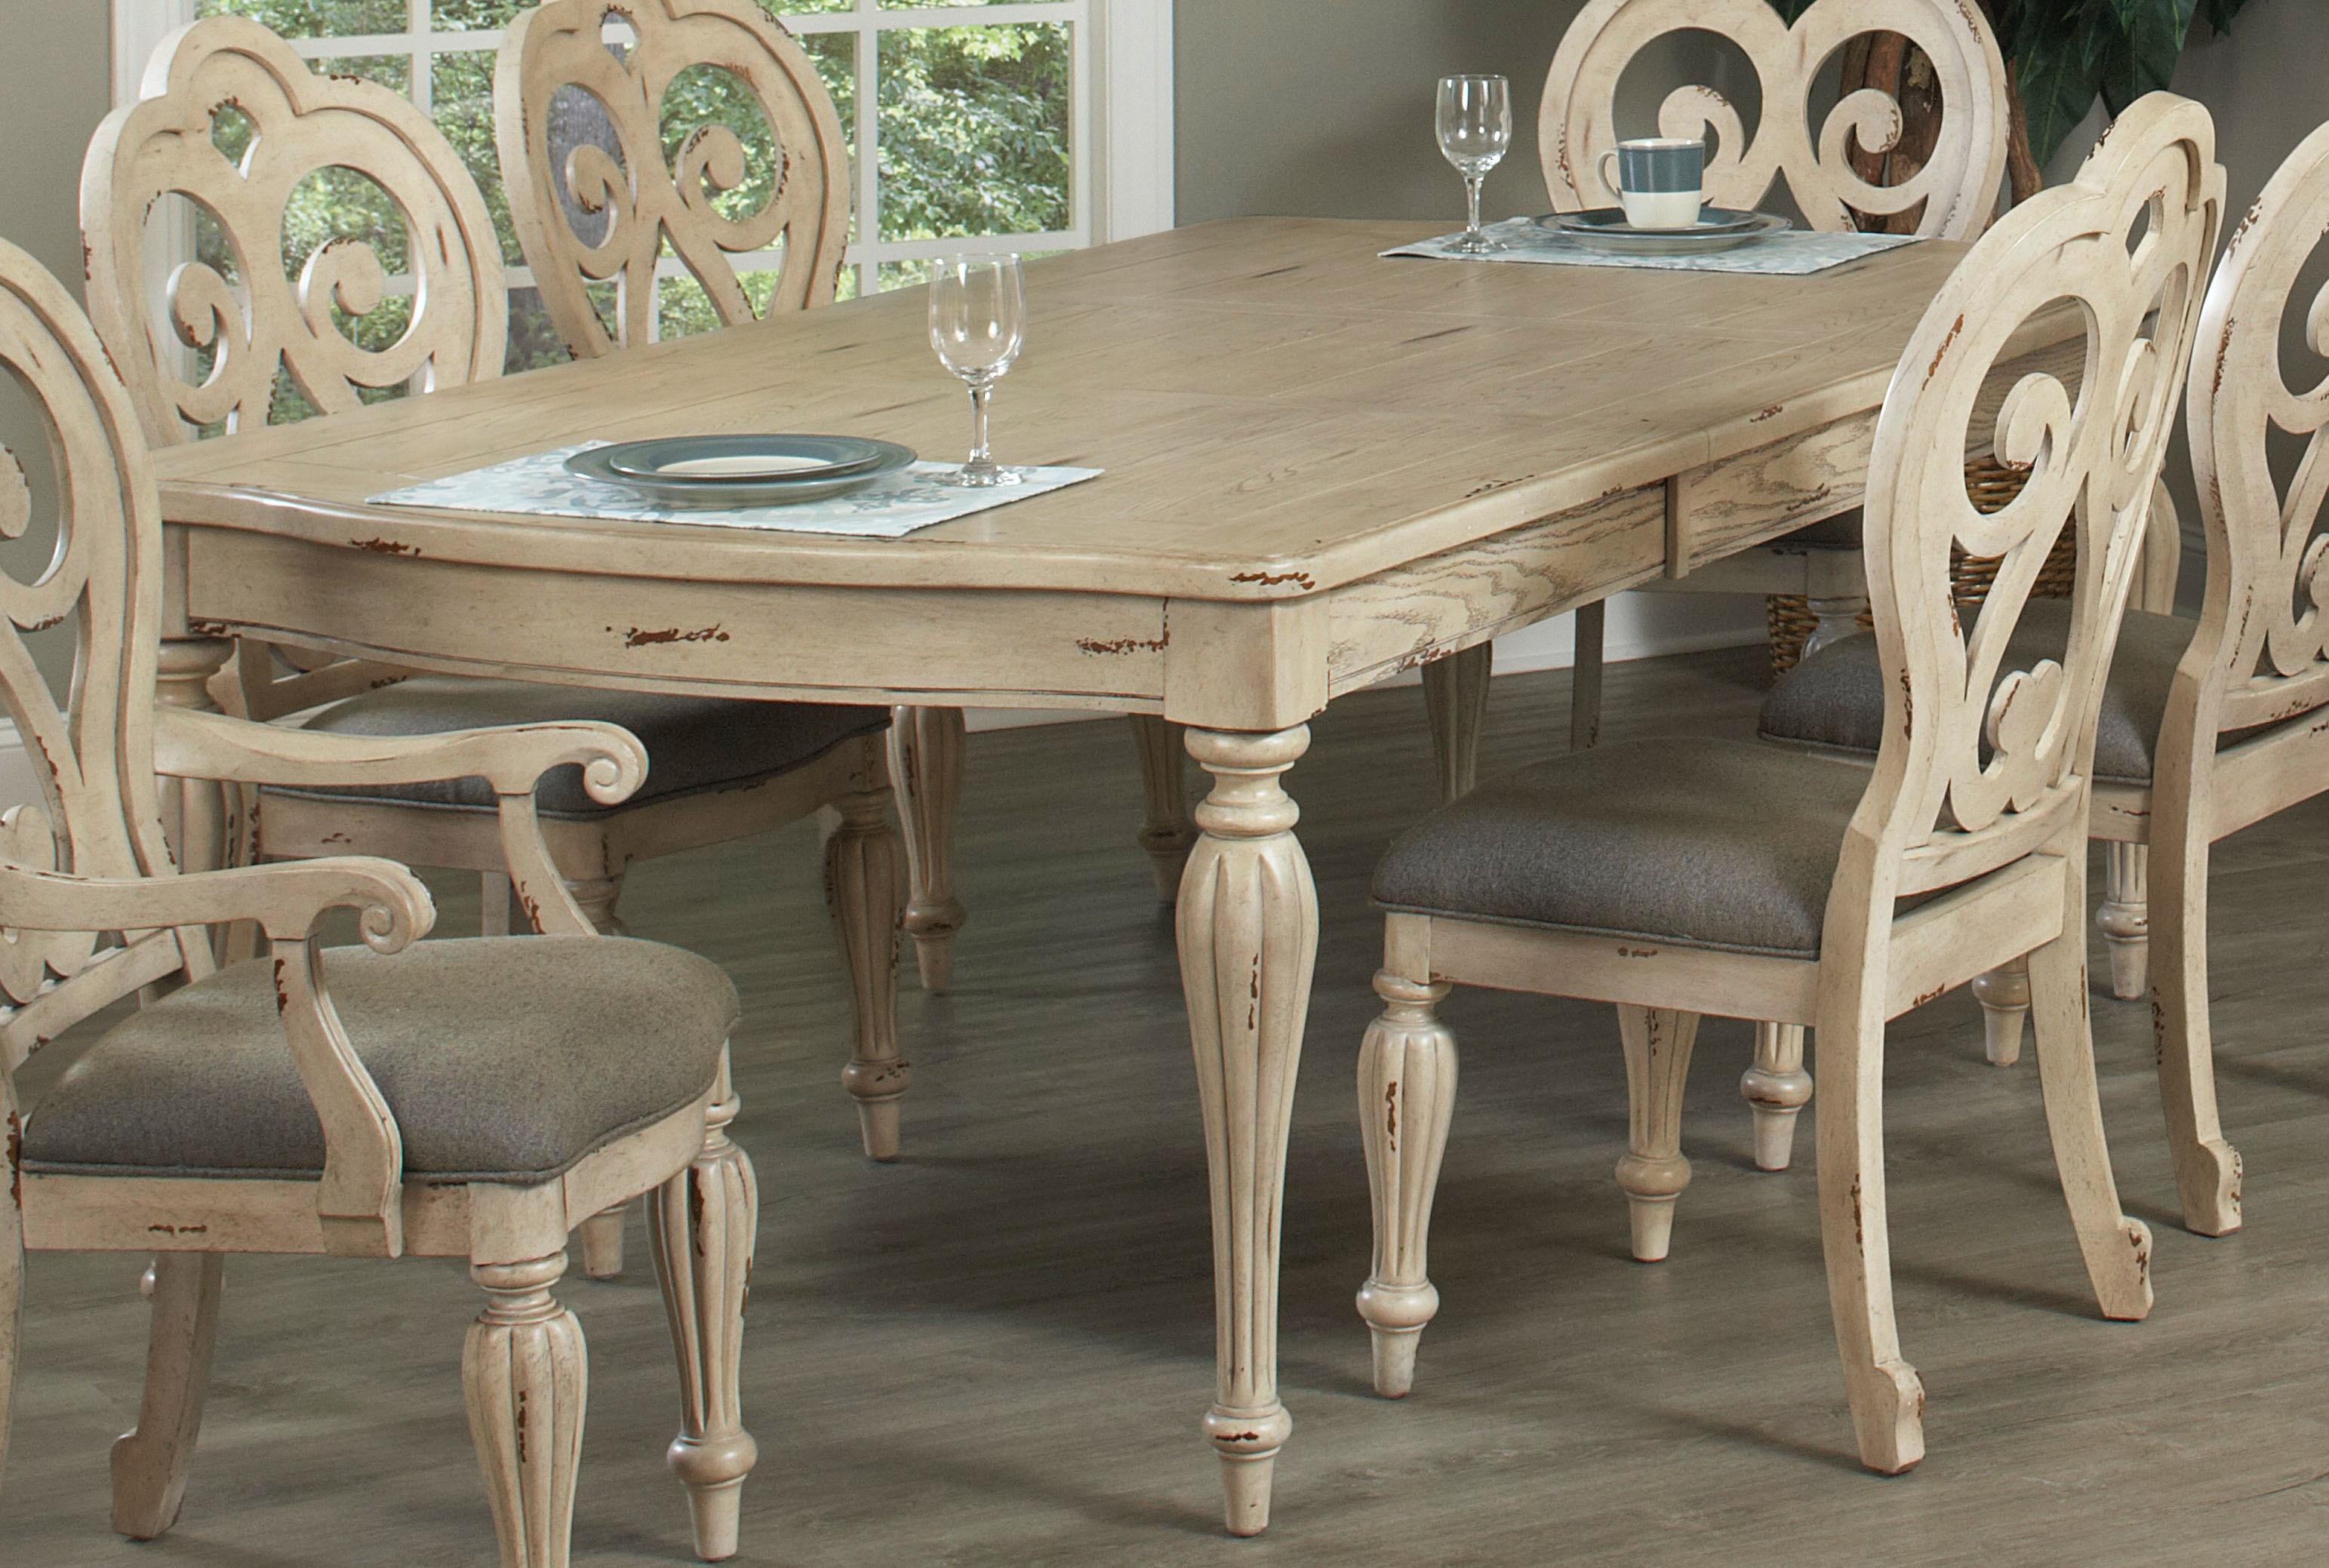 Amazing Largo International Leg Table With Leaf D4660 231